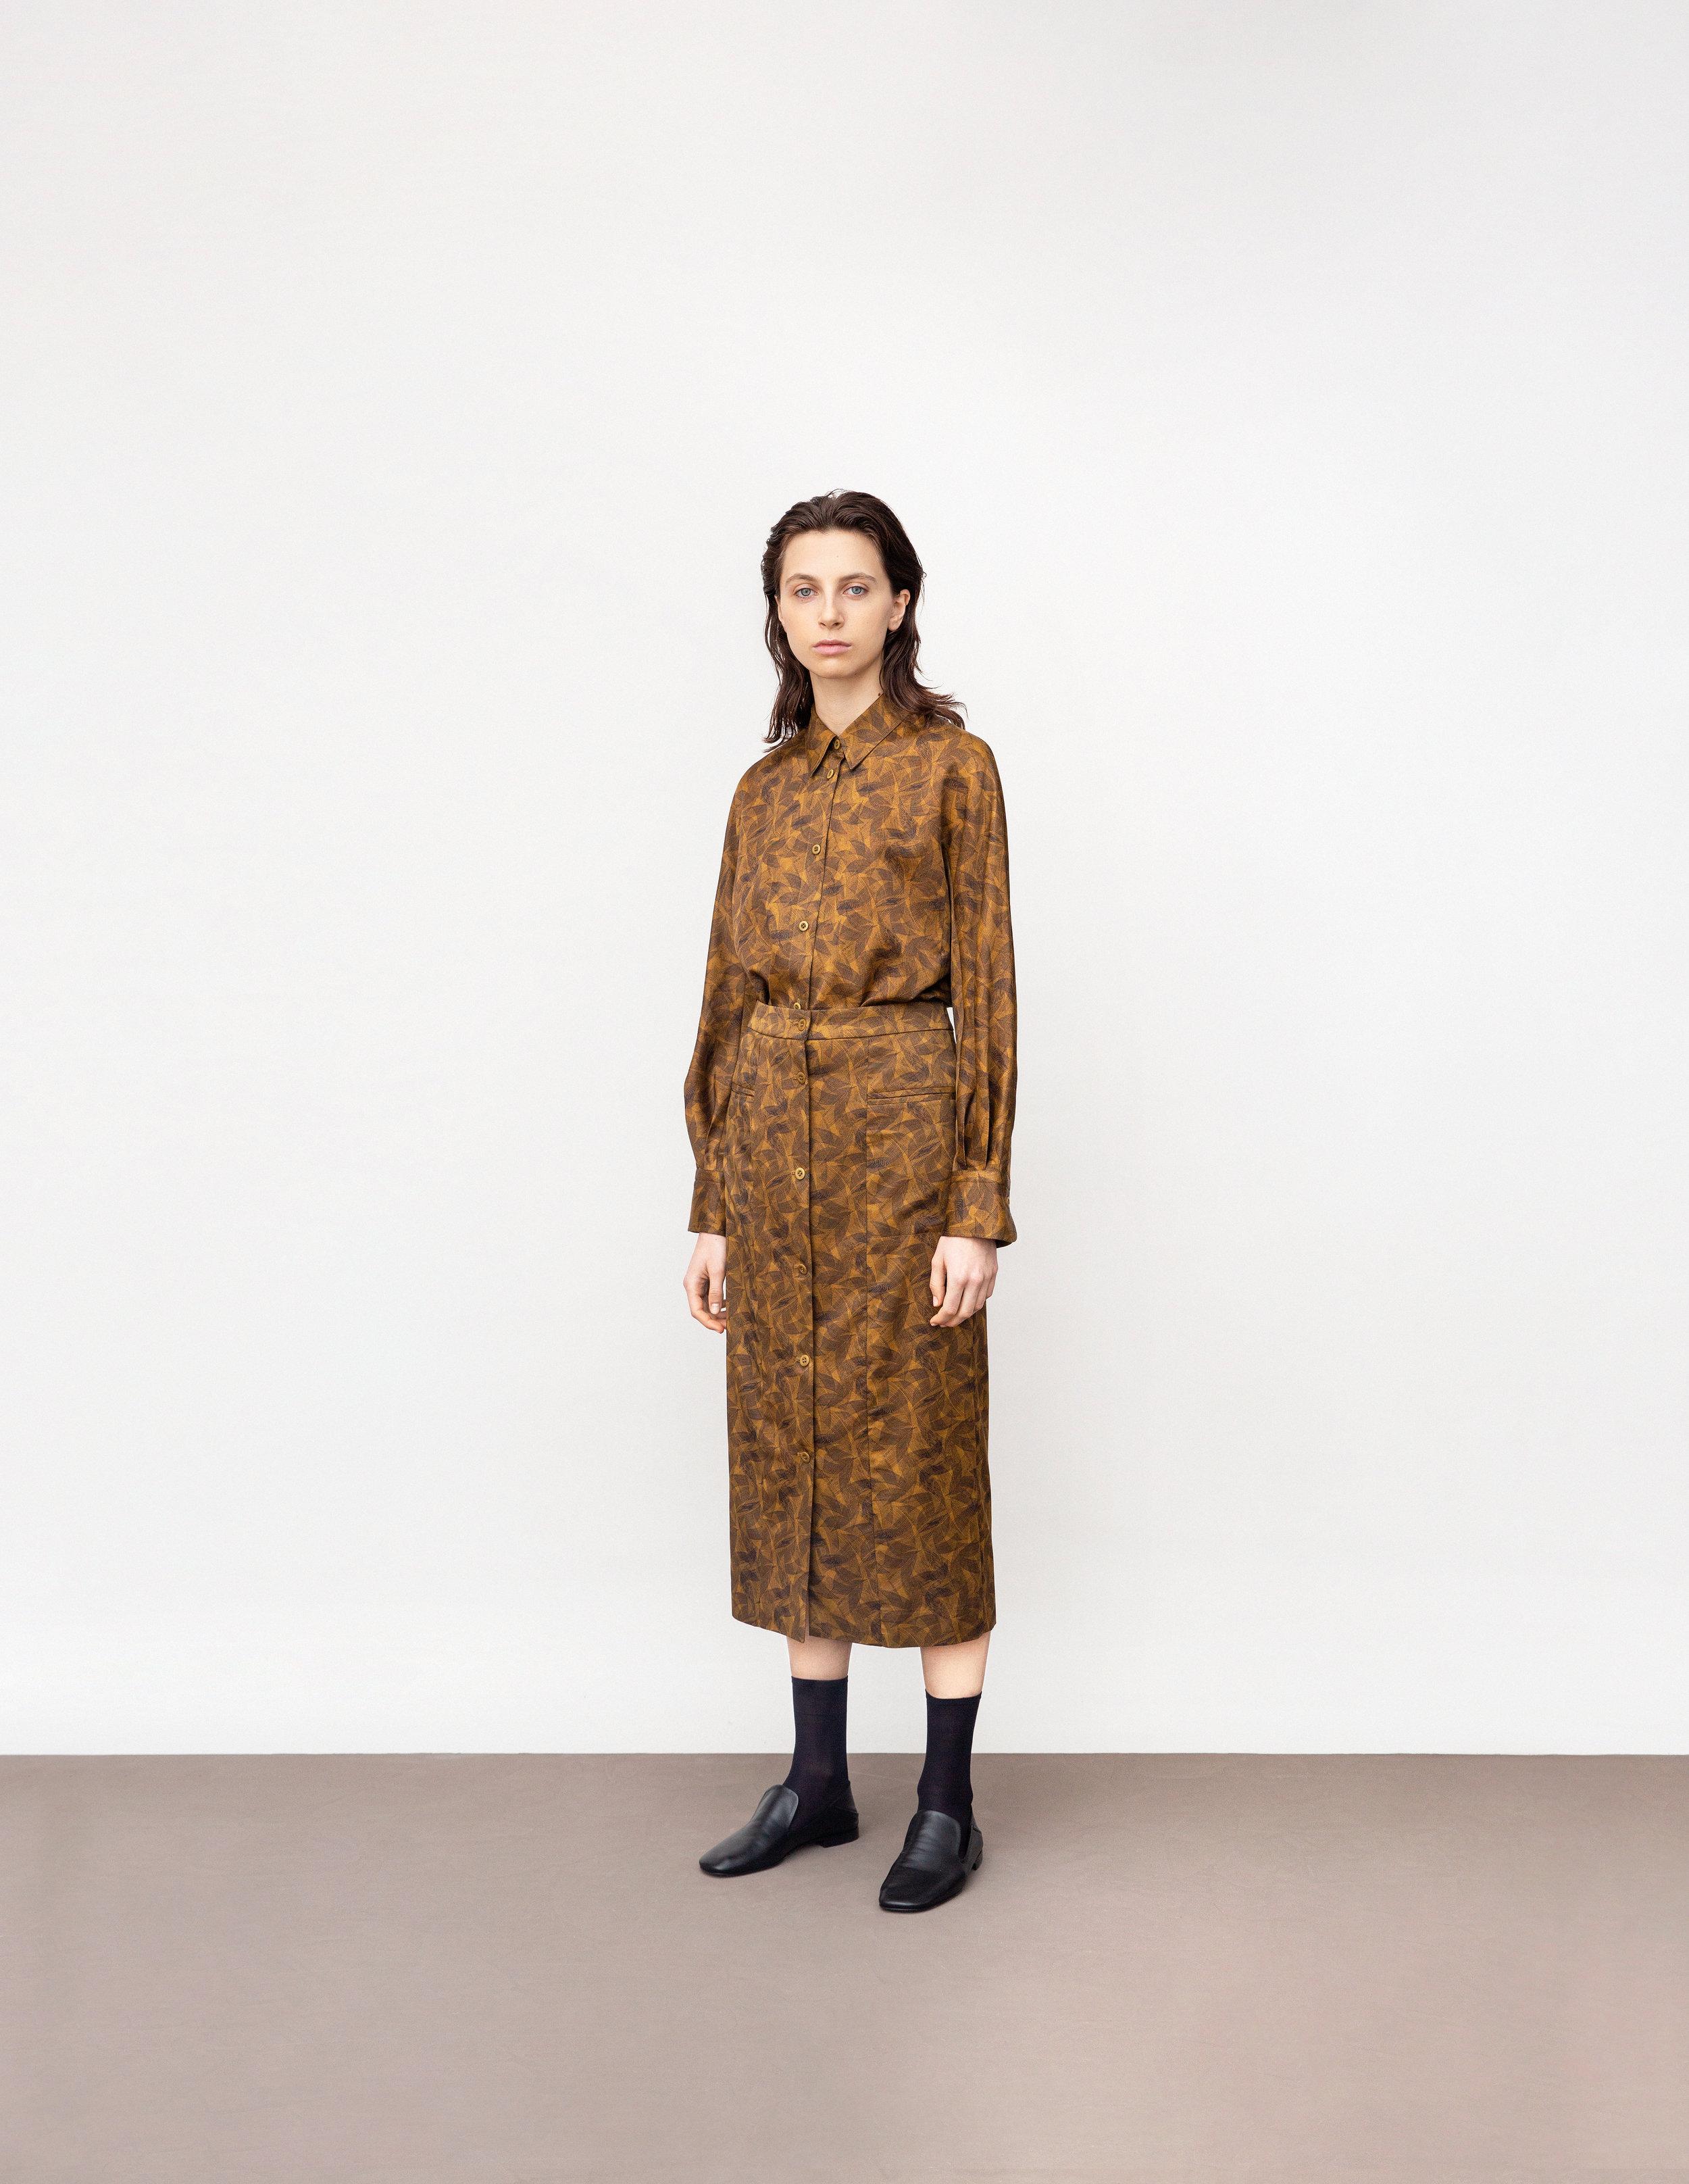 <b>5</b><br>Irina printed shirt<br>Krista printed skirt